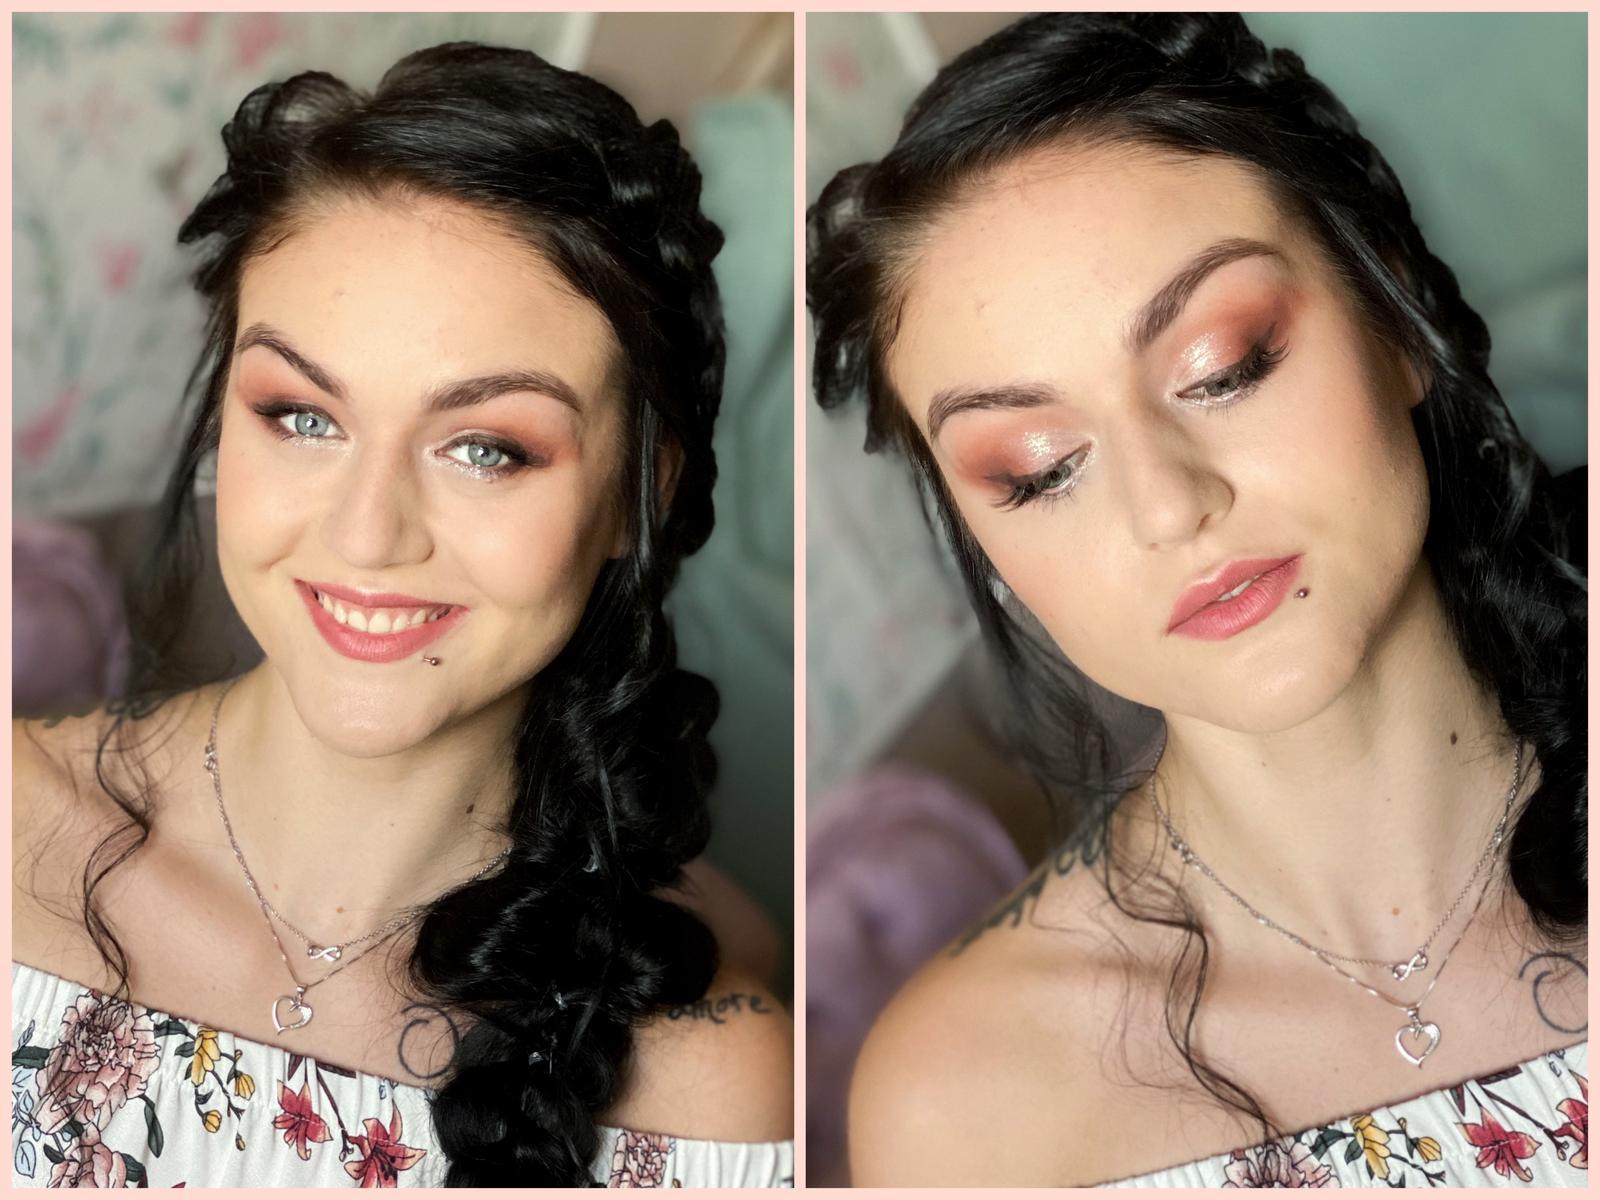 Makeup & hair 2020 - Stínované očko s linkou,nalepenými trsíky řas a spodní stříbrnou linkou🙏🏻💛